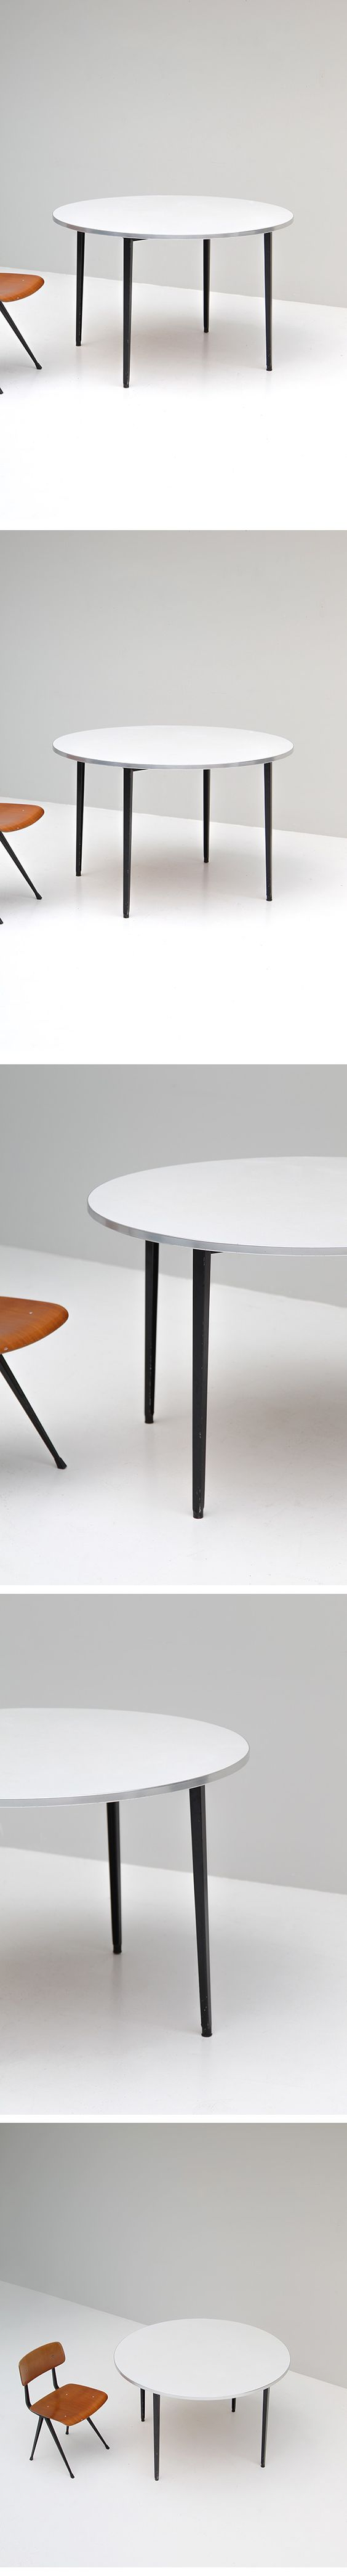 Friso Kramer, rare, round, Reform, dining table, Ahrend De Cirkel, du